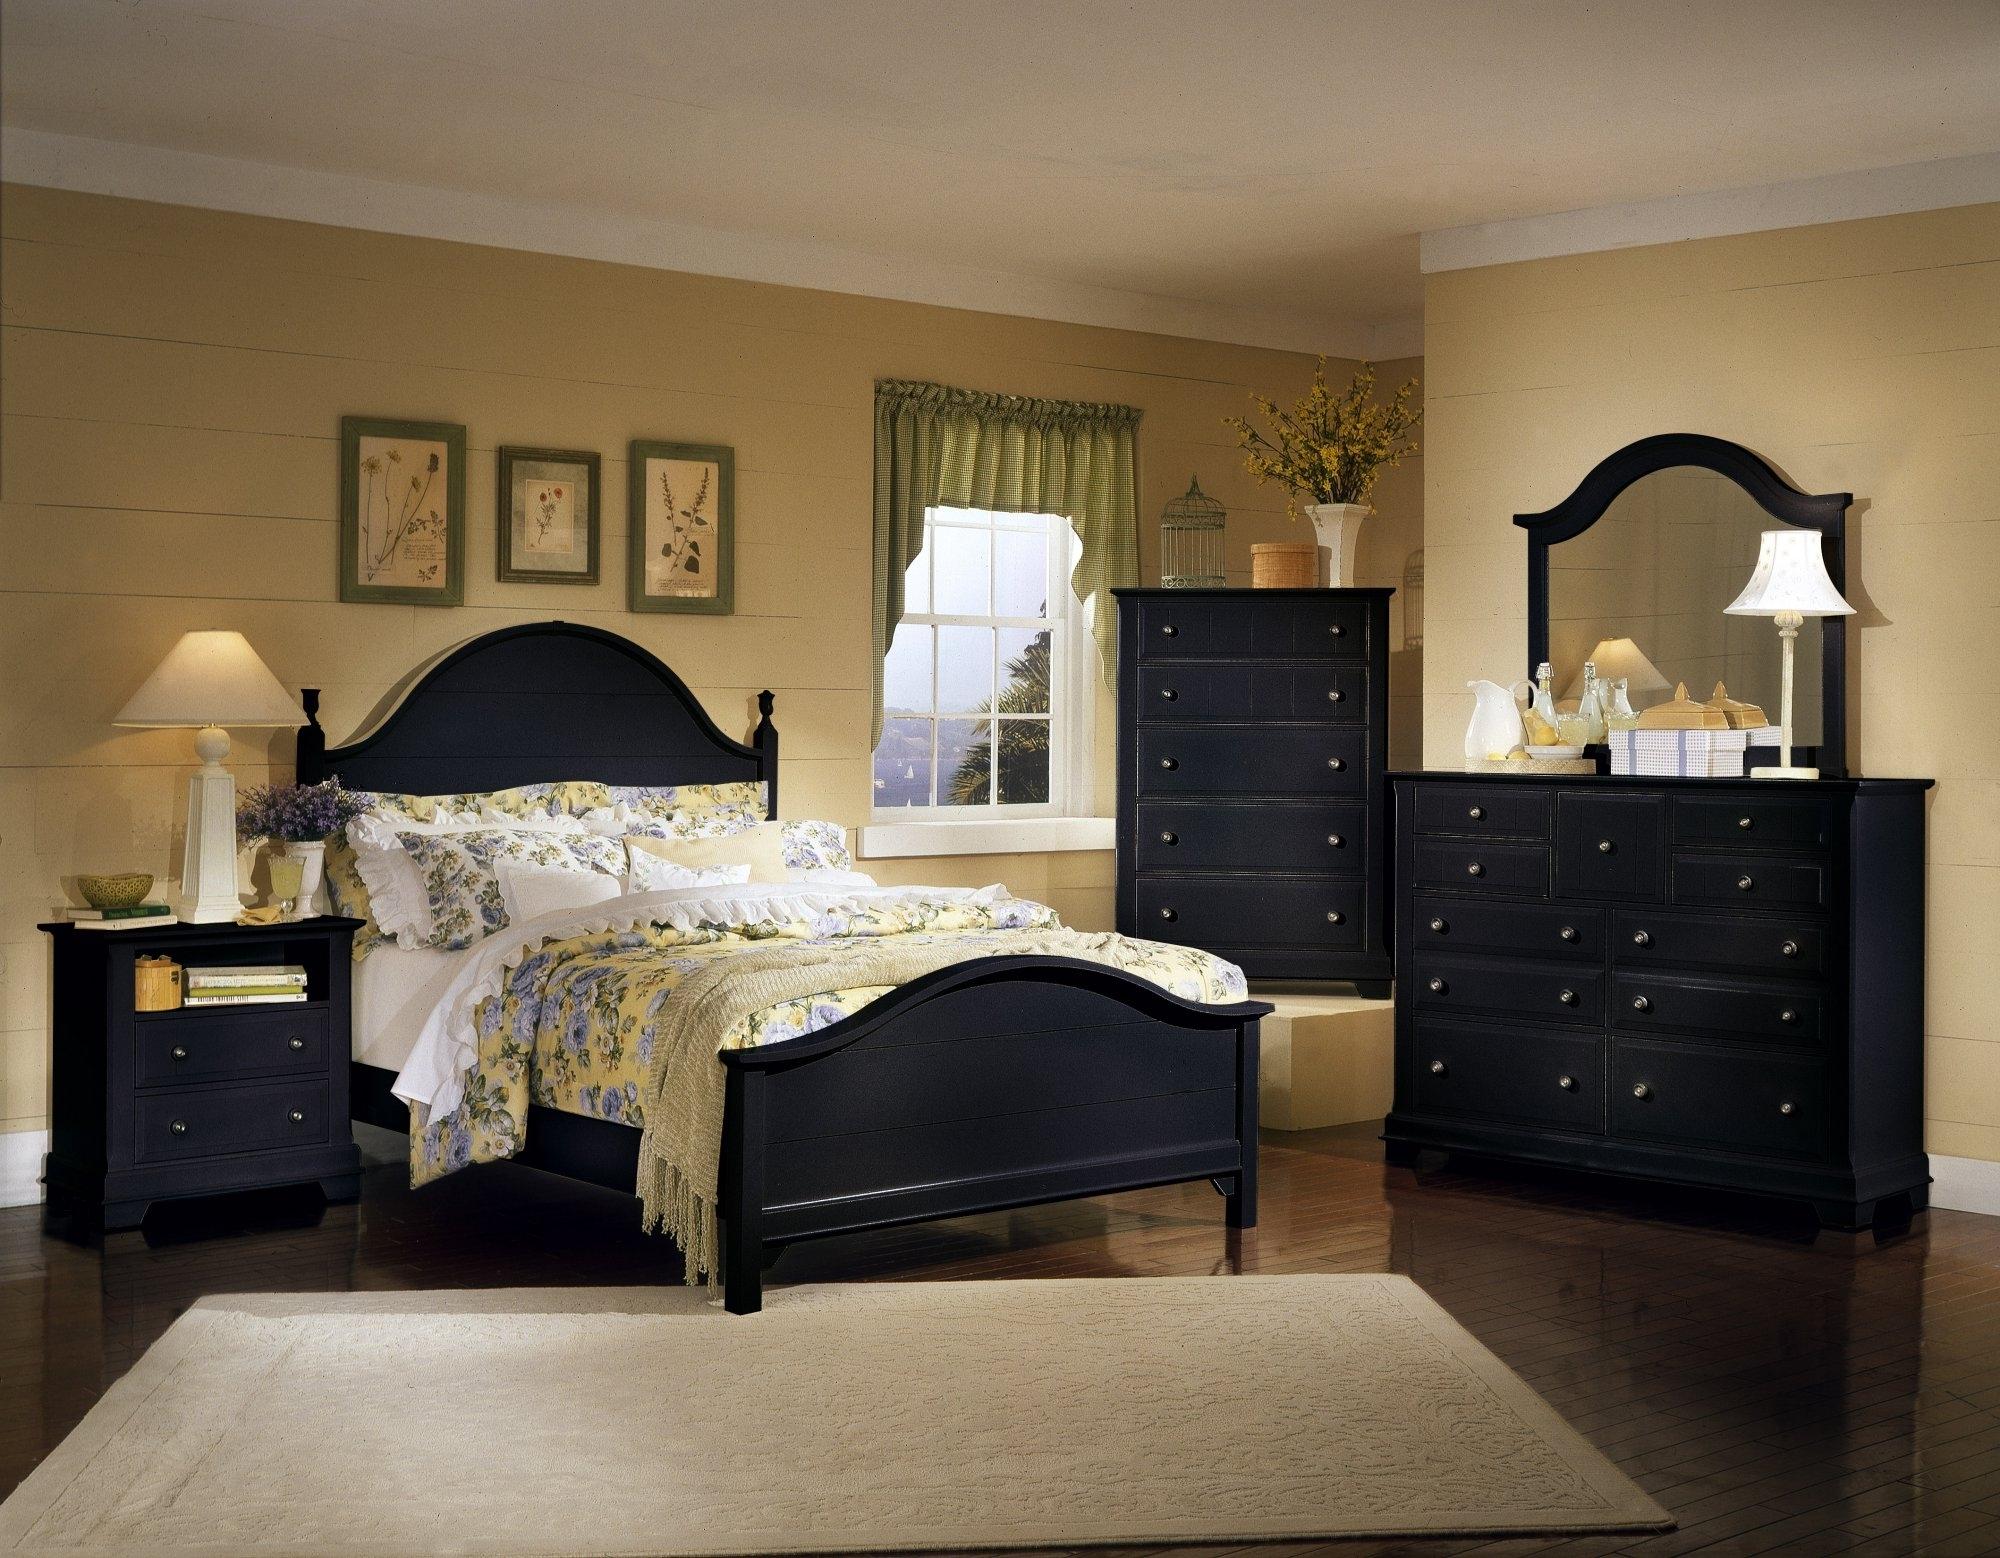 black bedroom furniture decorating ideas photo - 10